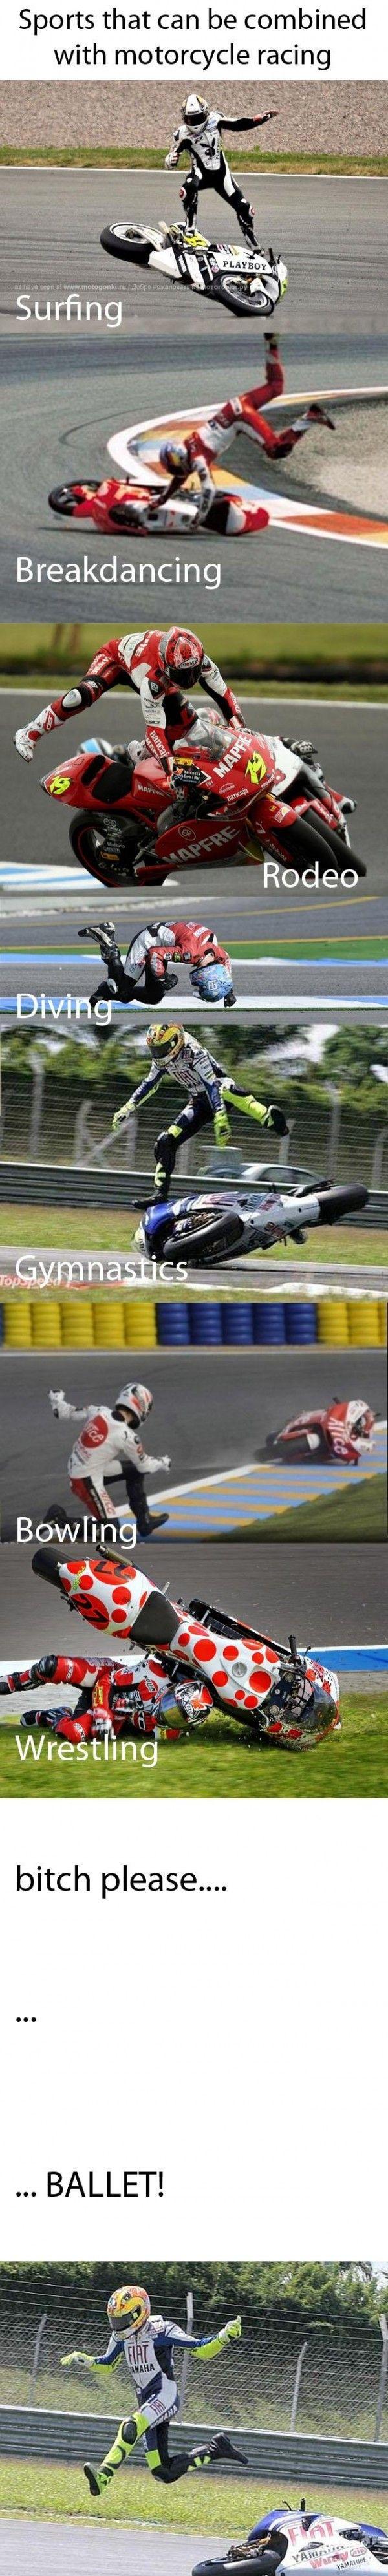 Funny Motorcycle Crashes